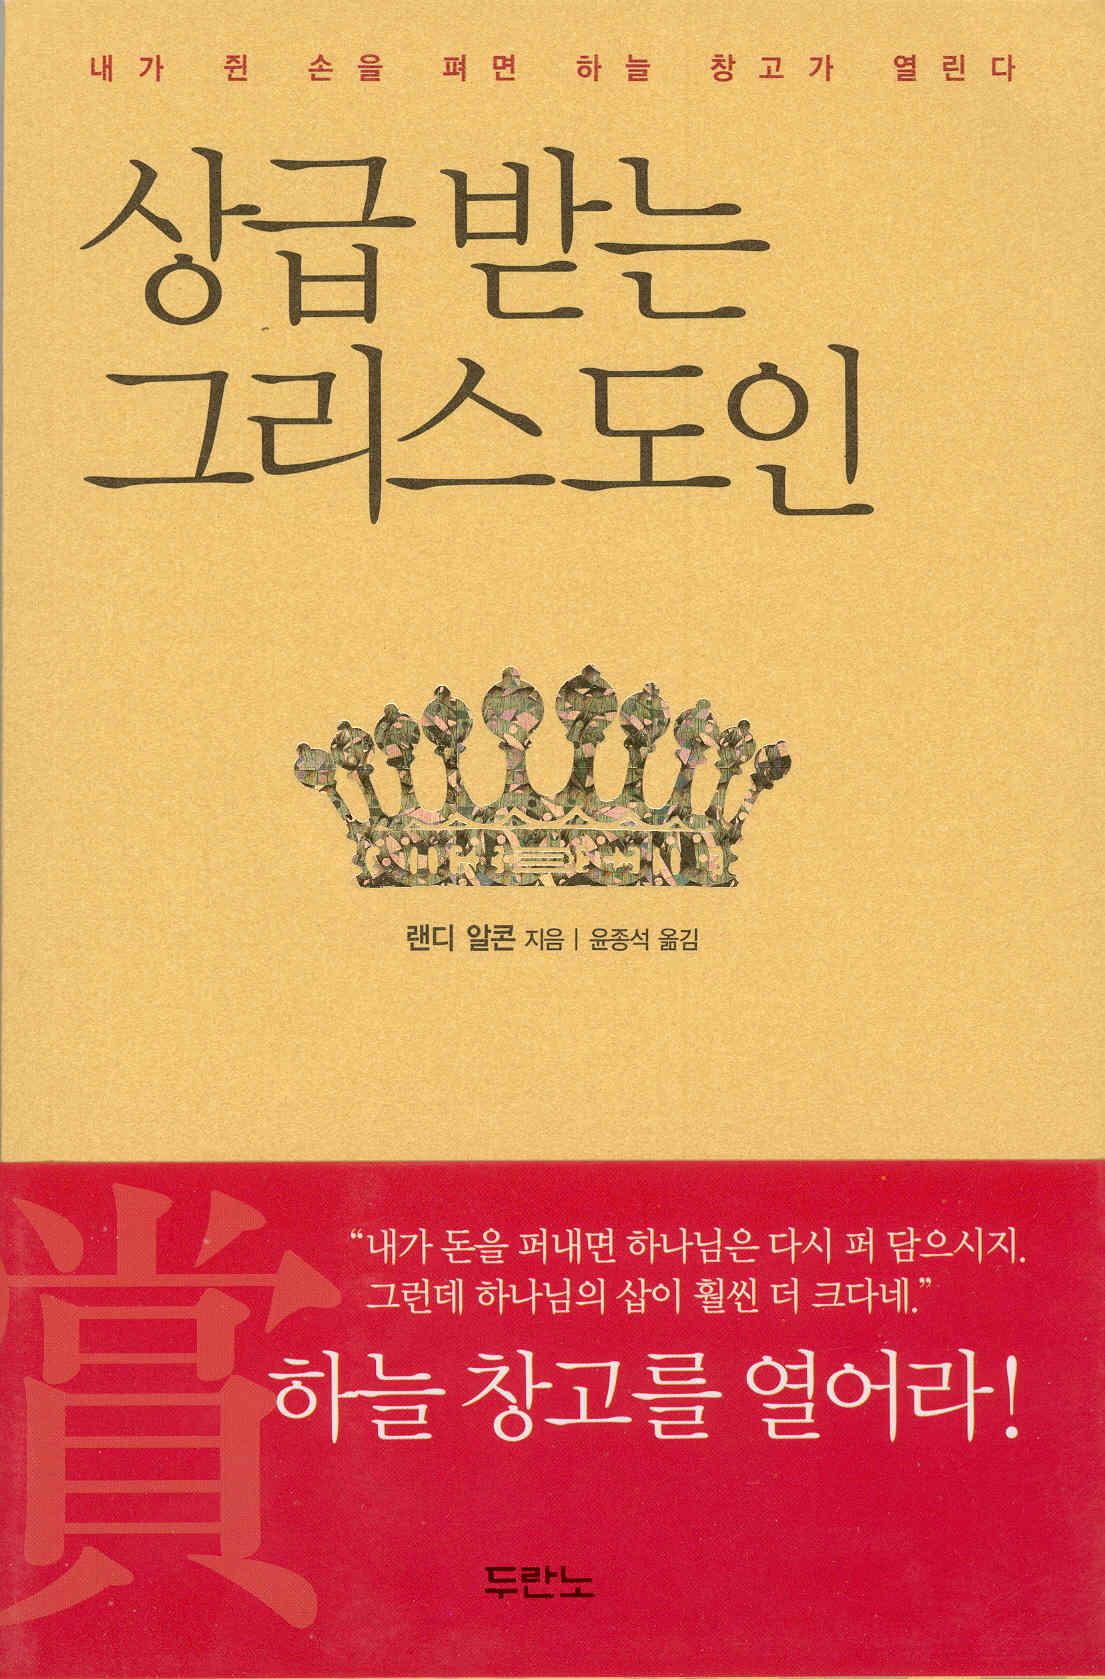 law-of-rewards-korean.jpg